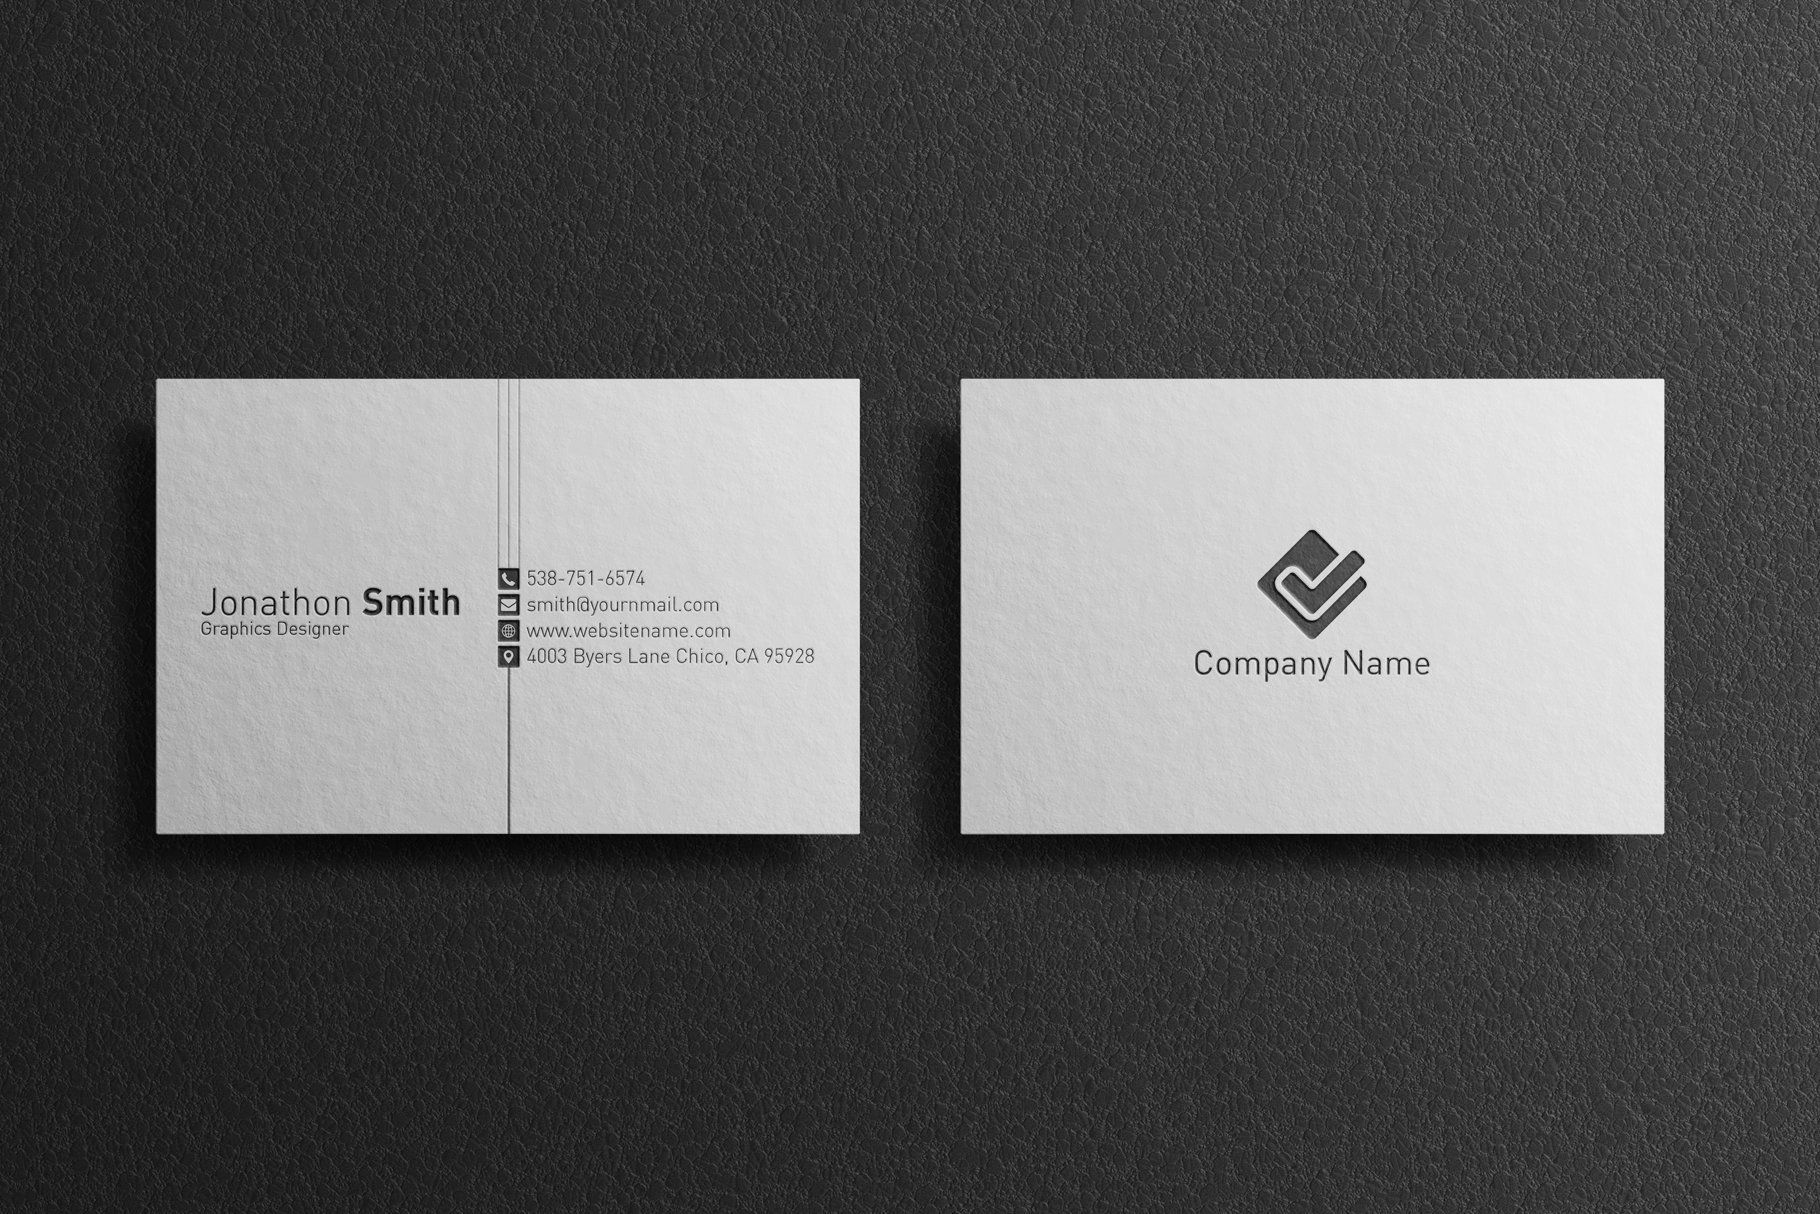 Corporate Business Card Business Card Template Design Business Card Design Inspiration Business Cards Creative